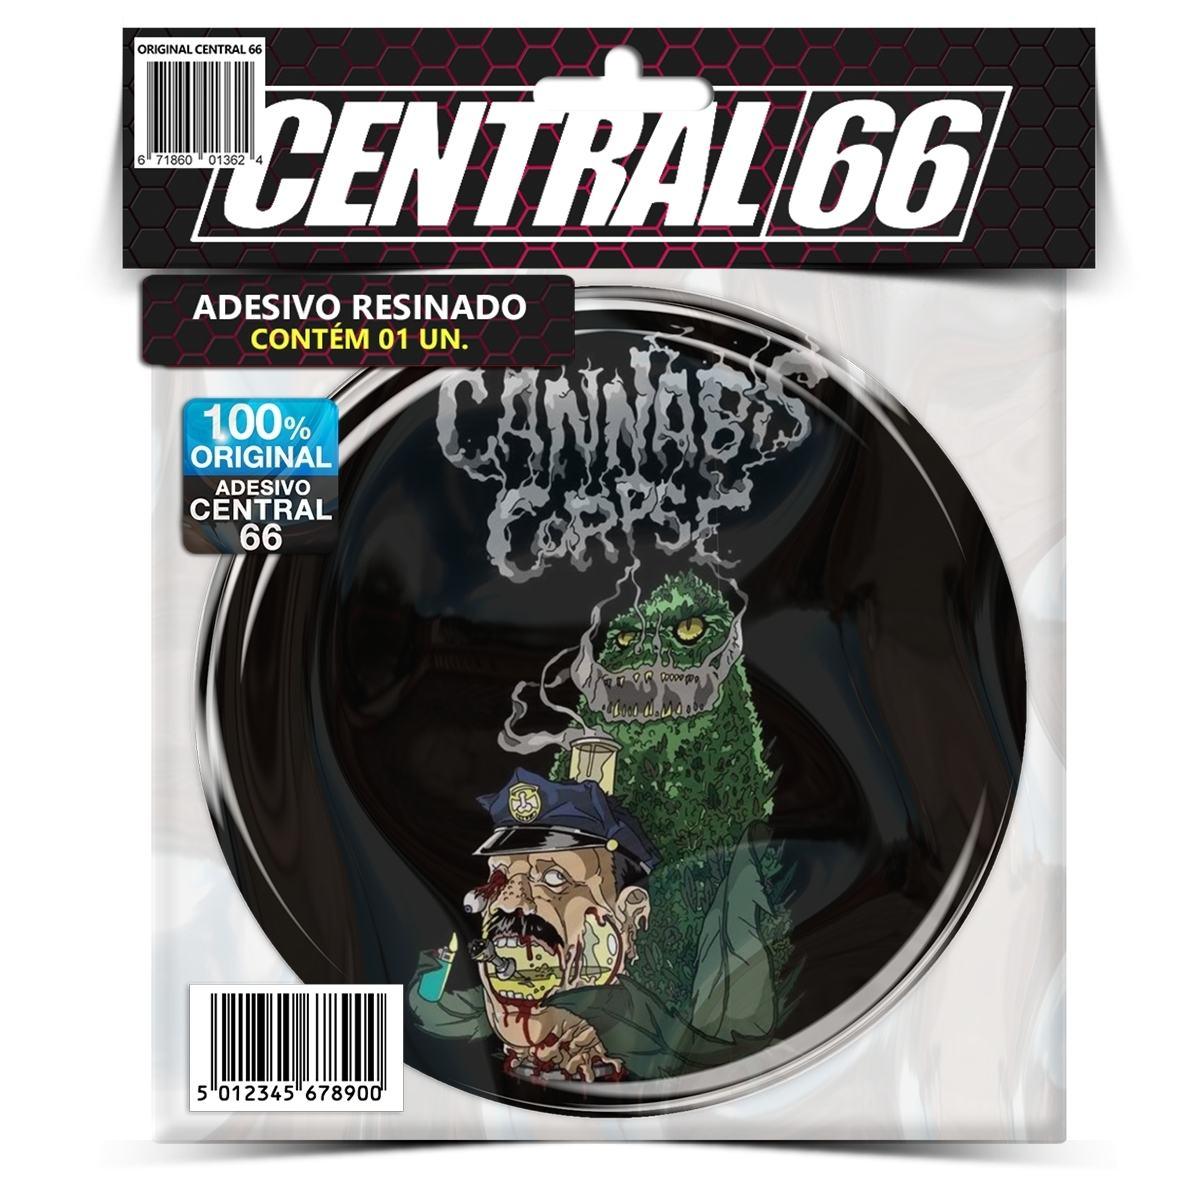 Adesivo Redondo Cannabis Corpse M05 – Central 66